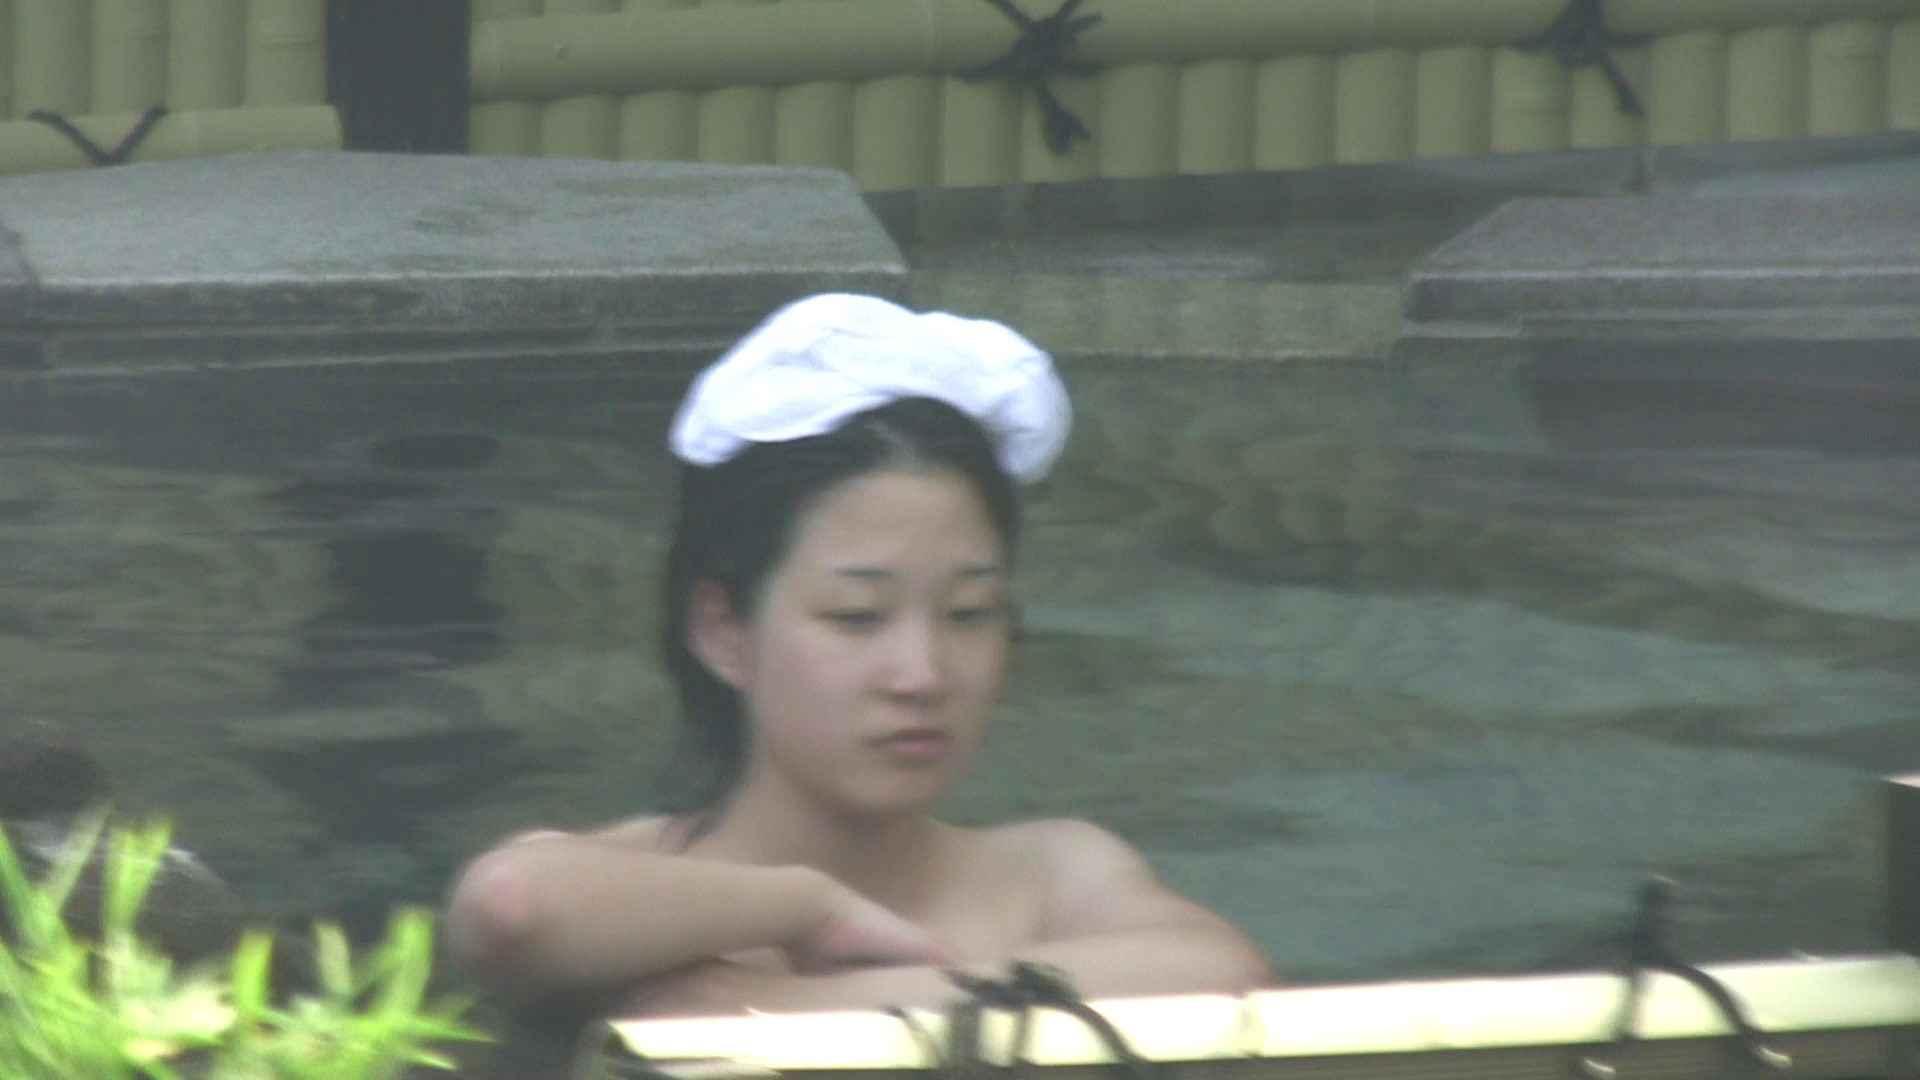 Aquaな露天風呂Vol.172 盗撮映像  113Pix 77